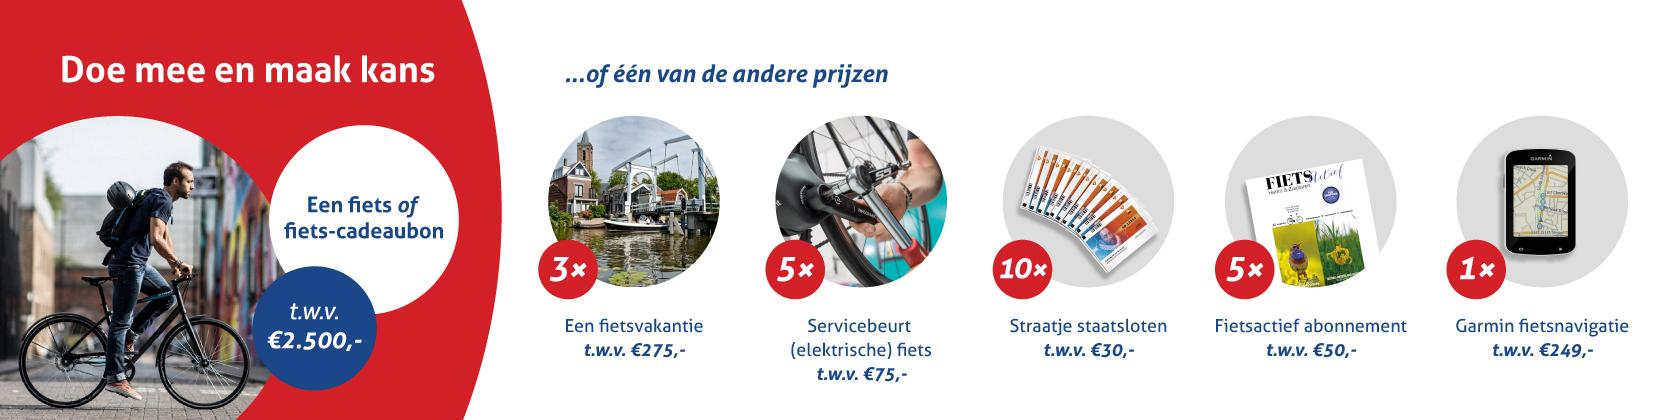 AD Fietstest.nl winactie